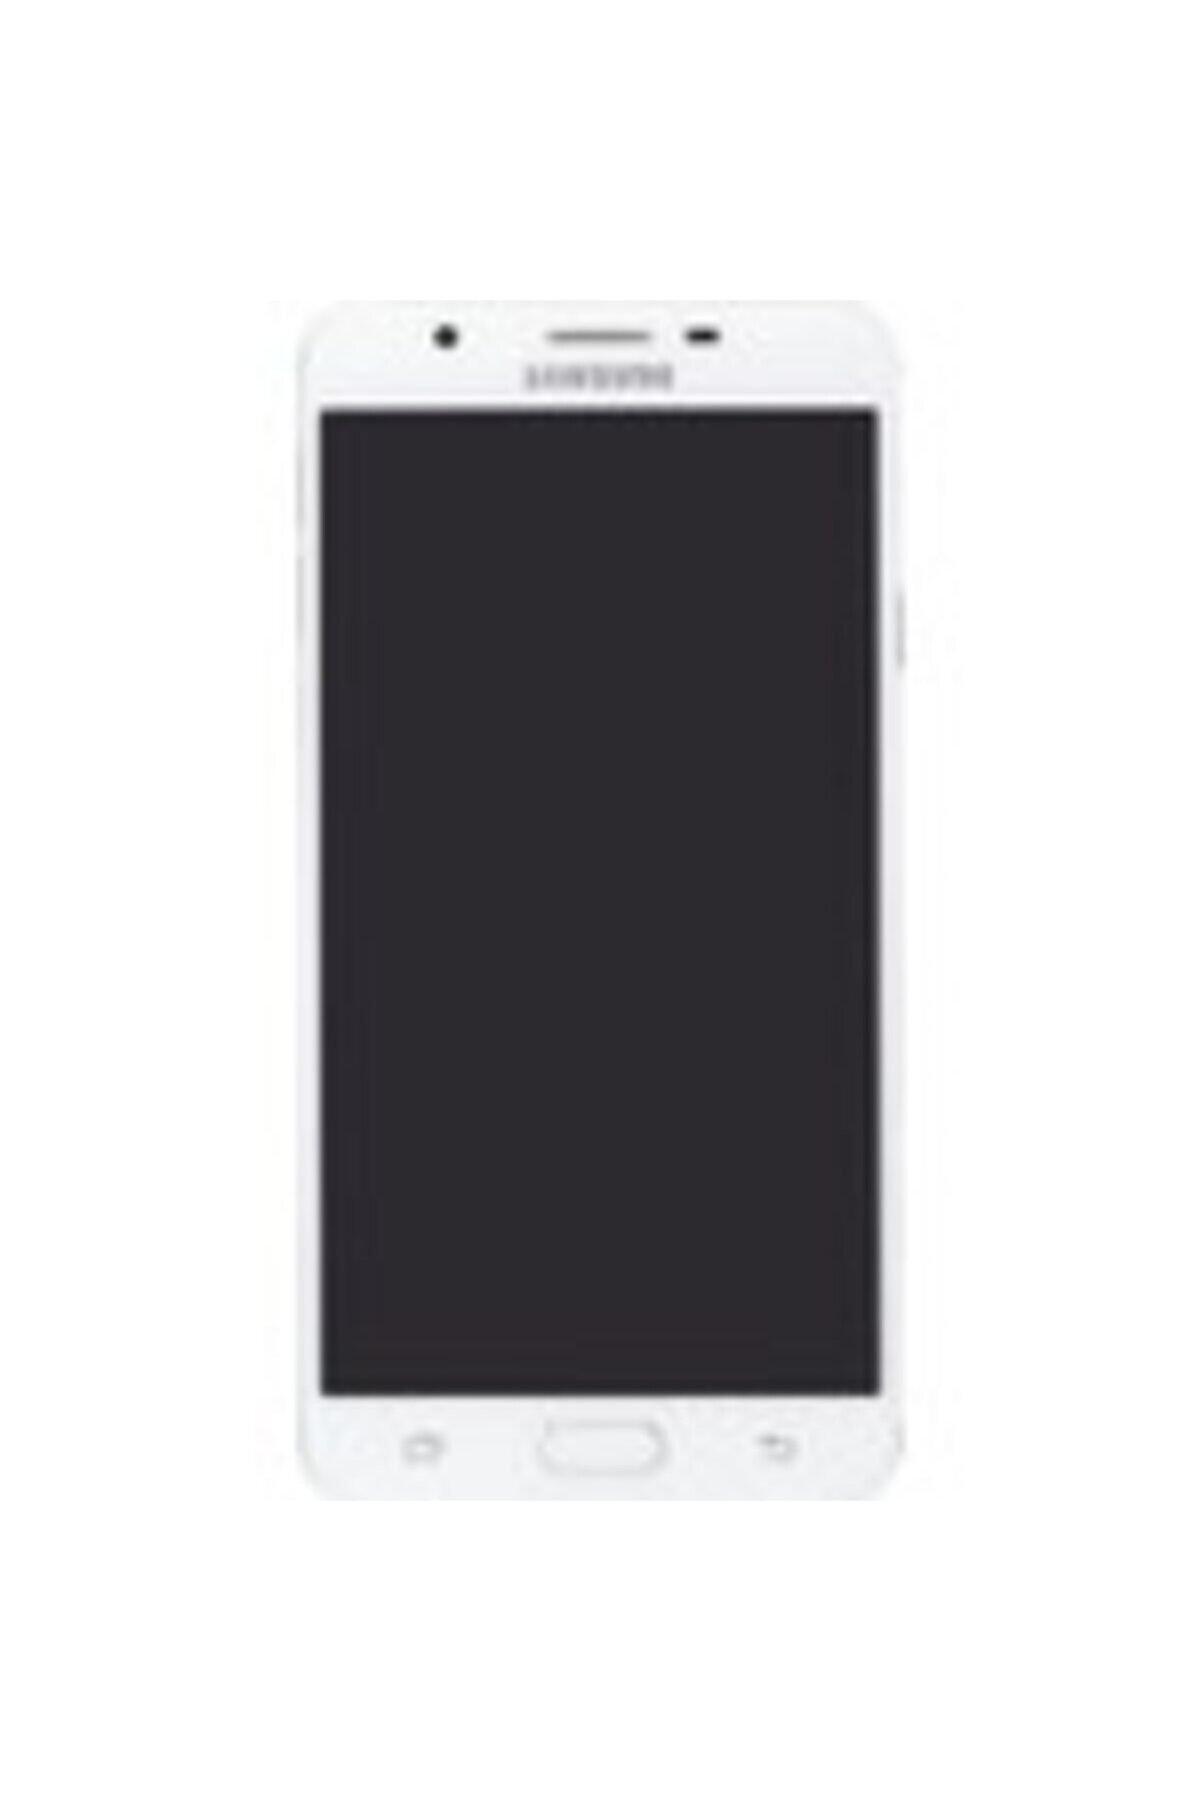 Samsung Galaxy J7 Prime 64 Gb Dual Sim